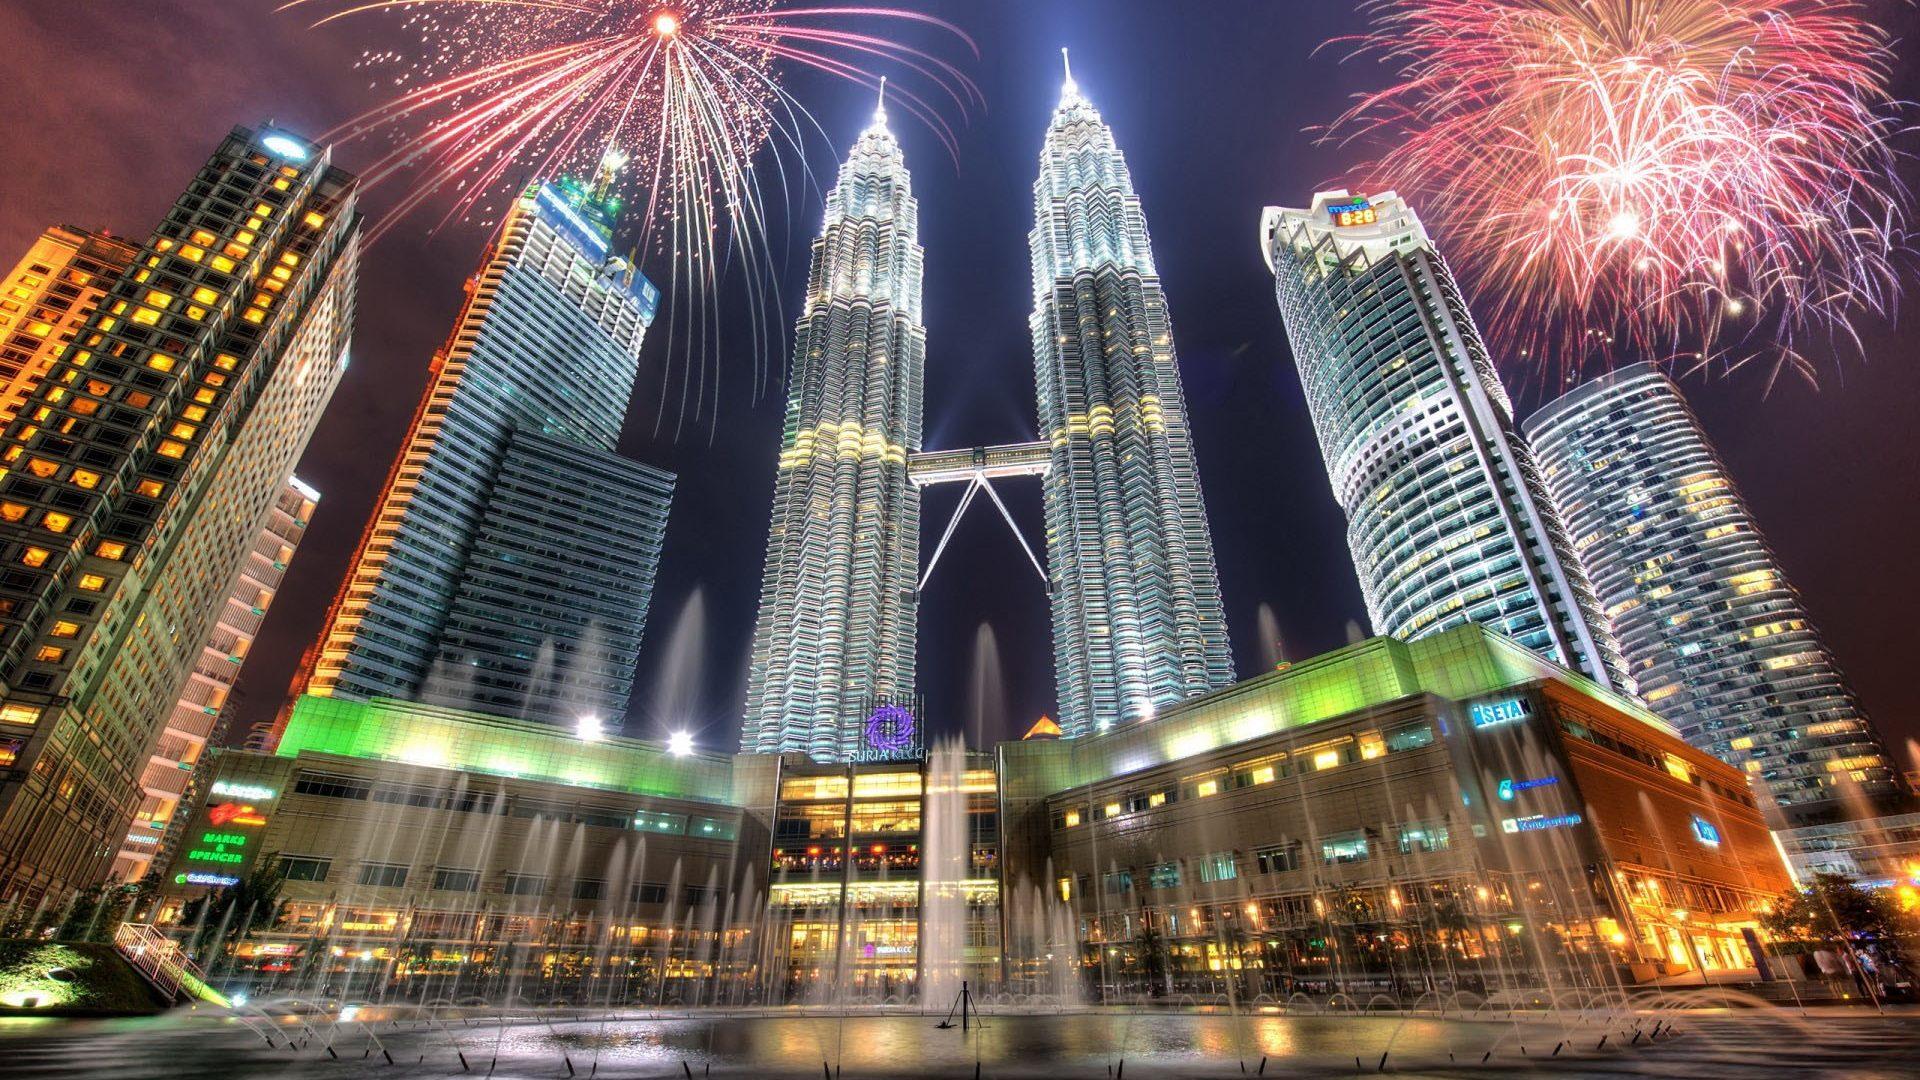 skyscrapers-petronas-towers-kuala-lumpur-fireworks-kuala-lumpur-malaysia-skyscripers-capital-scy-wallpapers-1920x1080